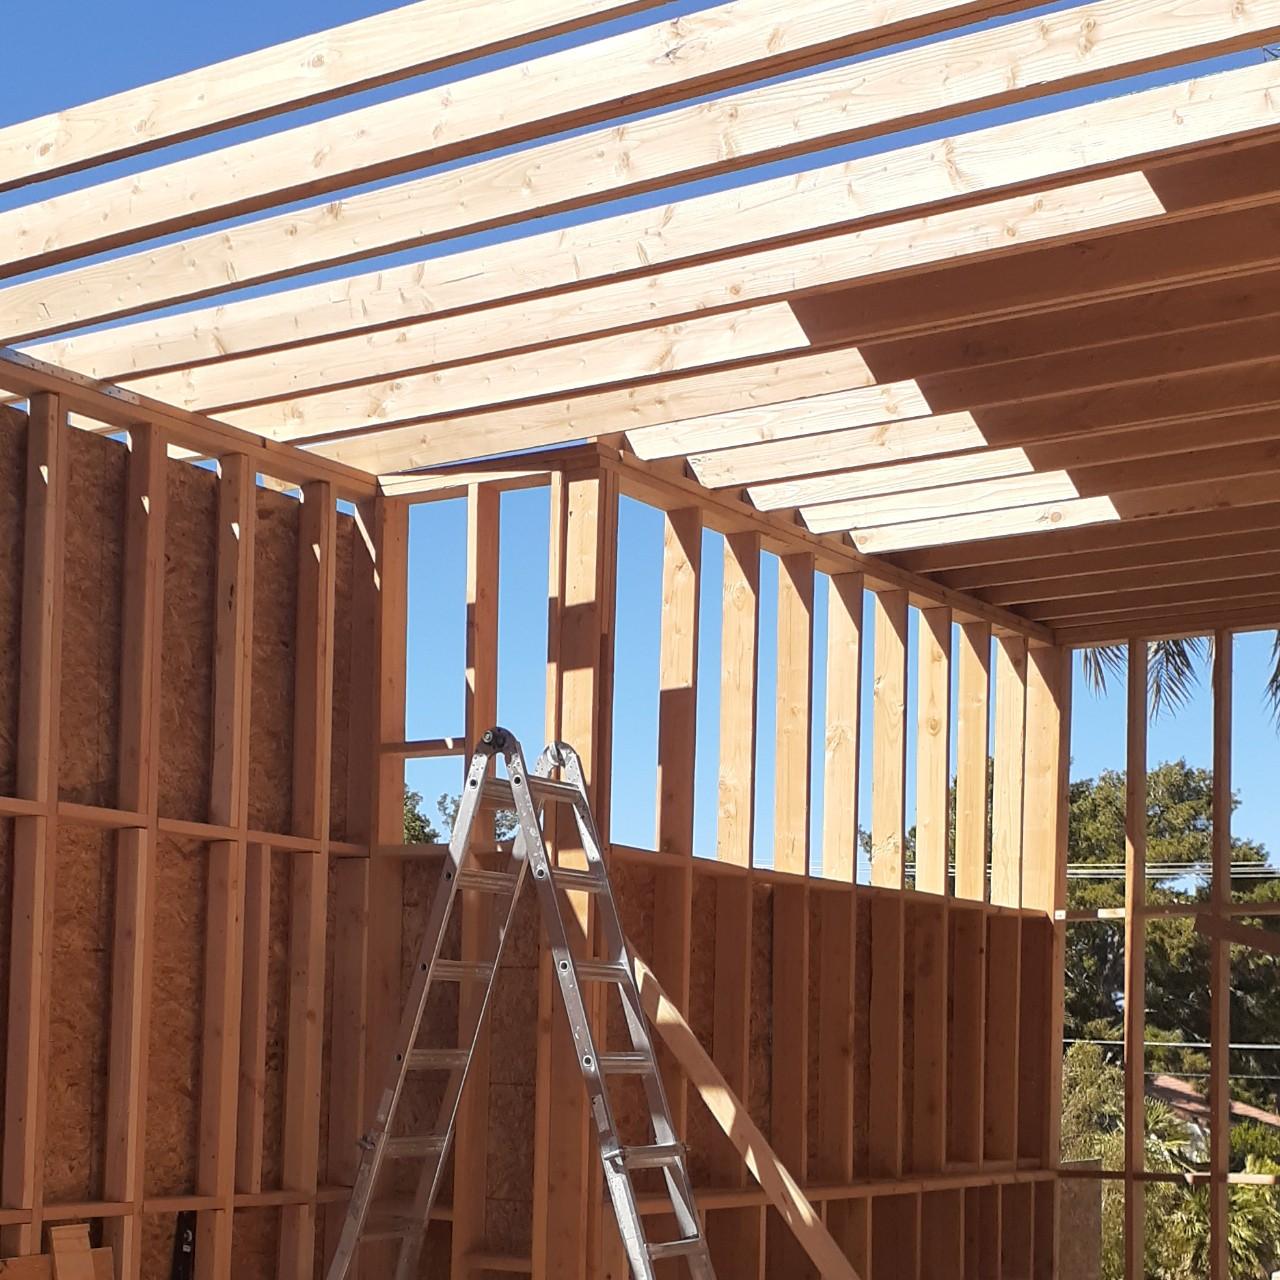 carpentry-wood-framing-second-floor-home-addition--framing-0